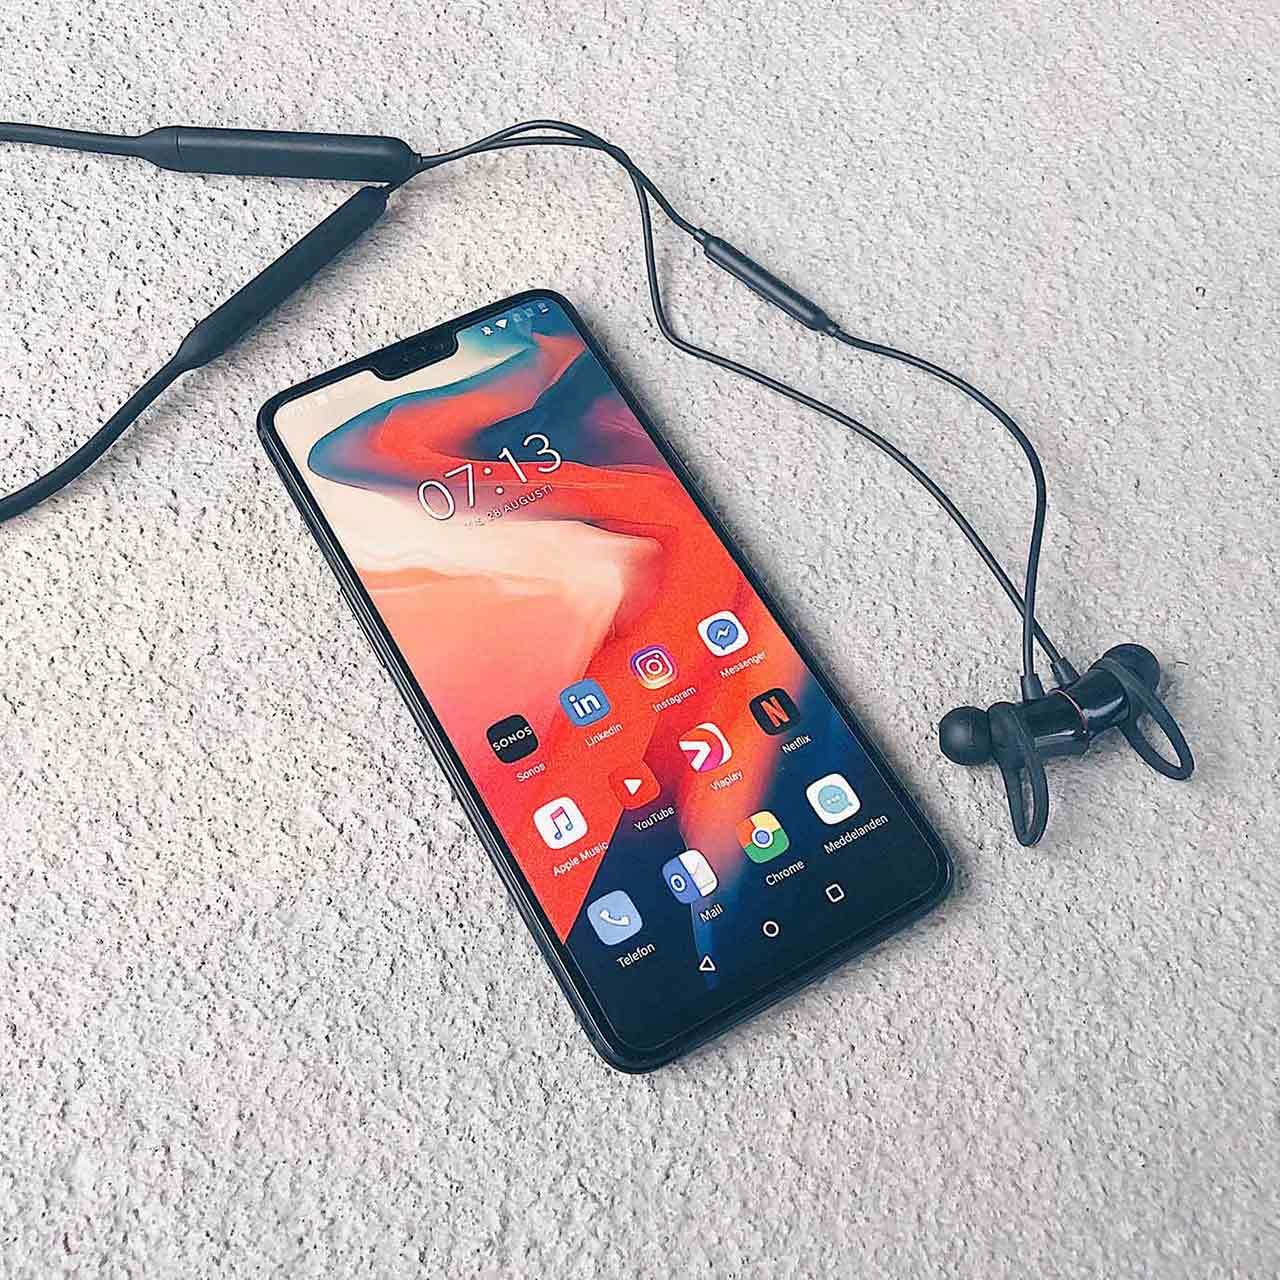 OnePlus Bullet Wireless